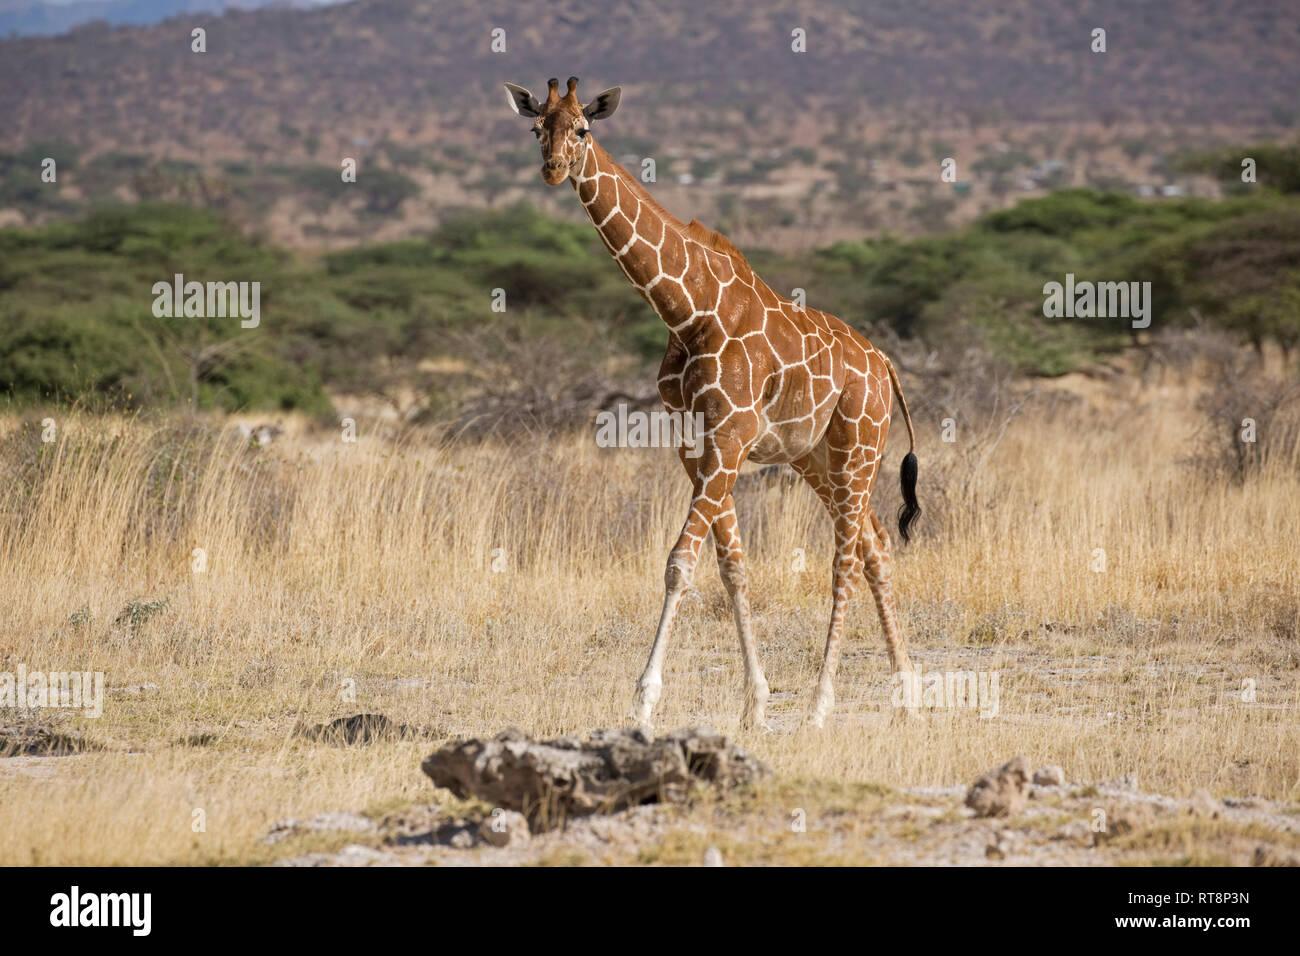 Aus vernetztem oder Somalischen giraffe Giraffa Camelopardalis reticulata,, in semi-ariden Grünland, Buffalo Springs National Reserve, Kenia Stockfoto